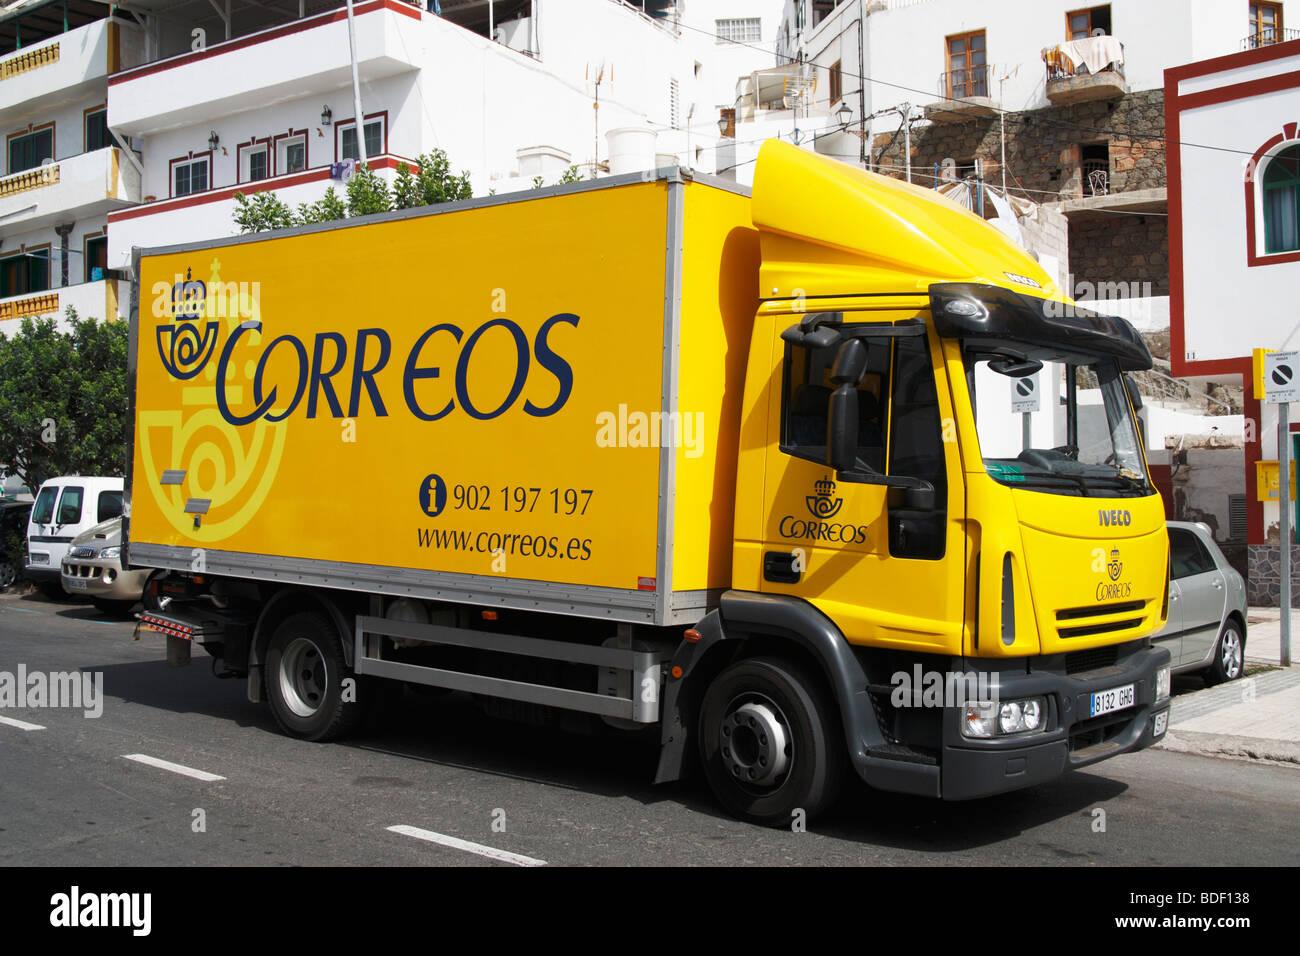 Spanish postal service (Correos) mail lorry - Stock Image